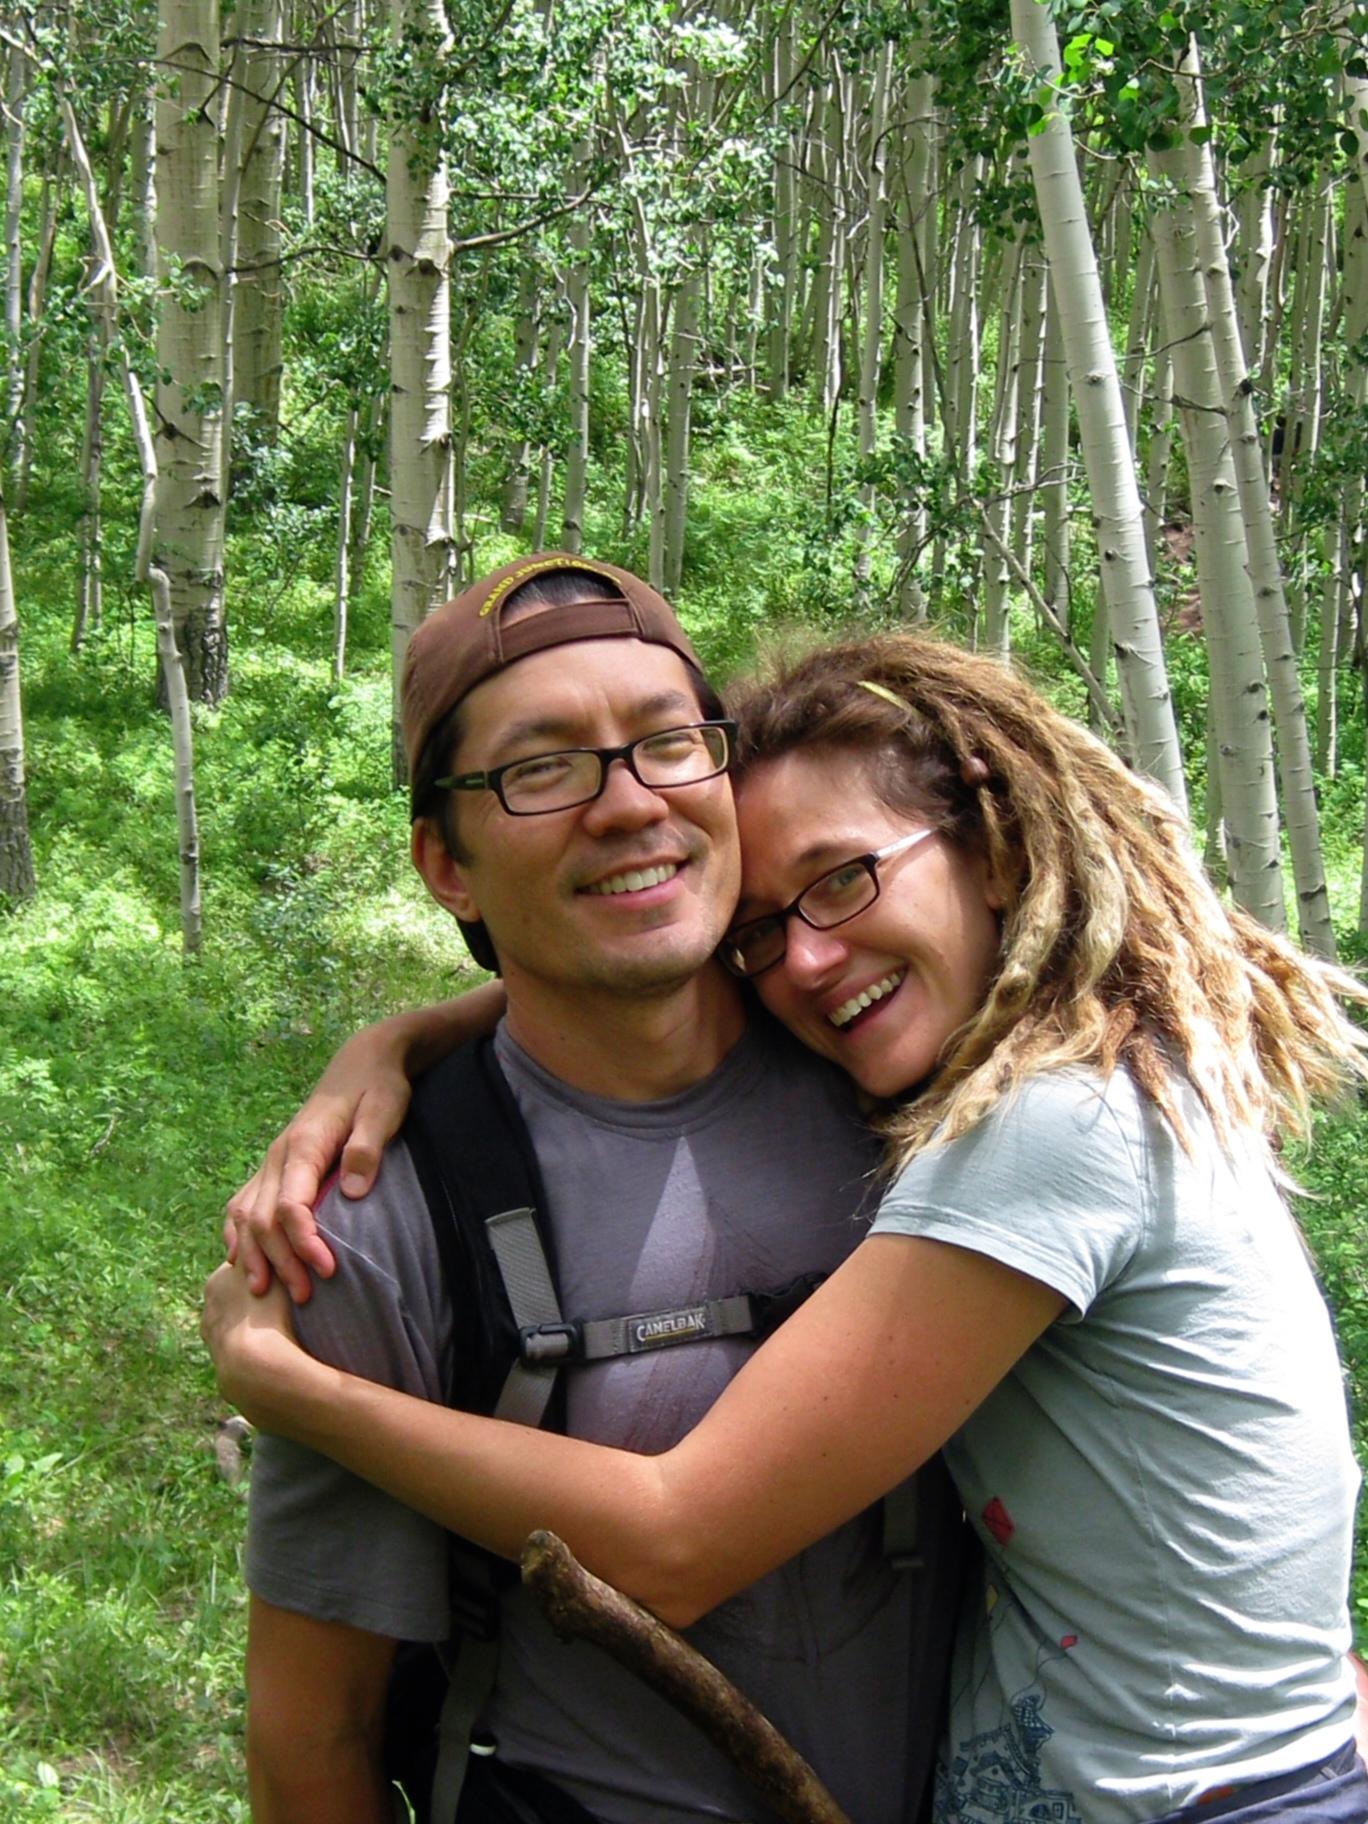 aspen trees, hiking, backpacking, chinos, dreadlocks